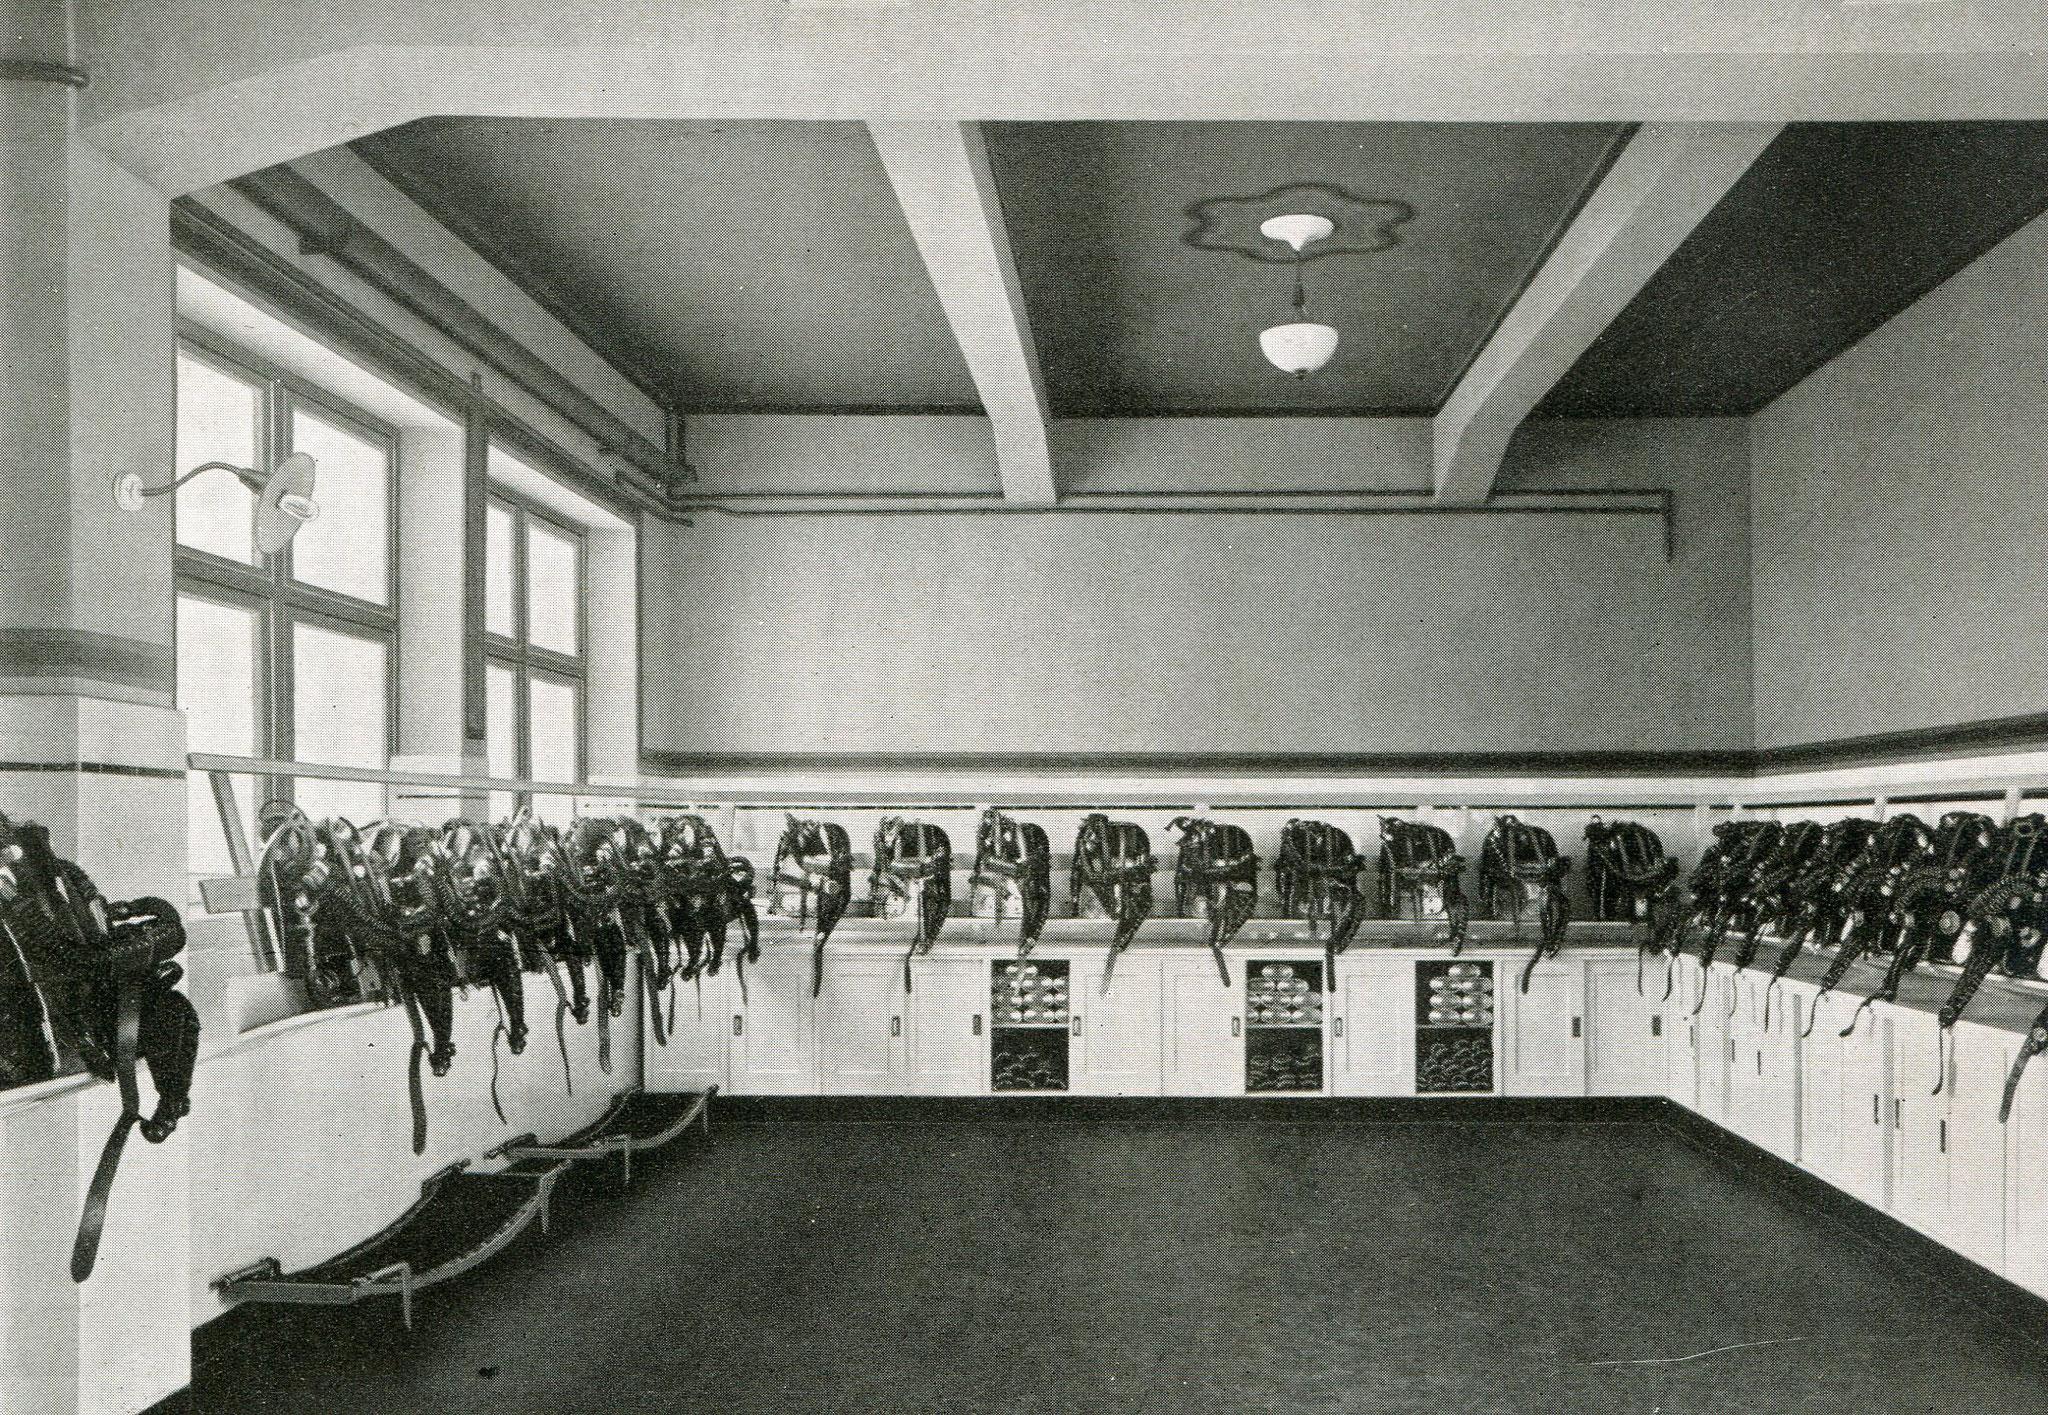 Hauptrettungslager Prosper 1 in Essen  1925  Gasschutzgeräte Modell 1924